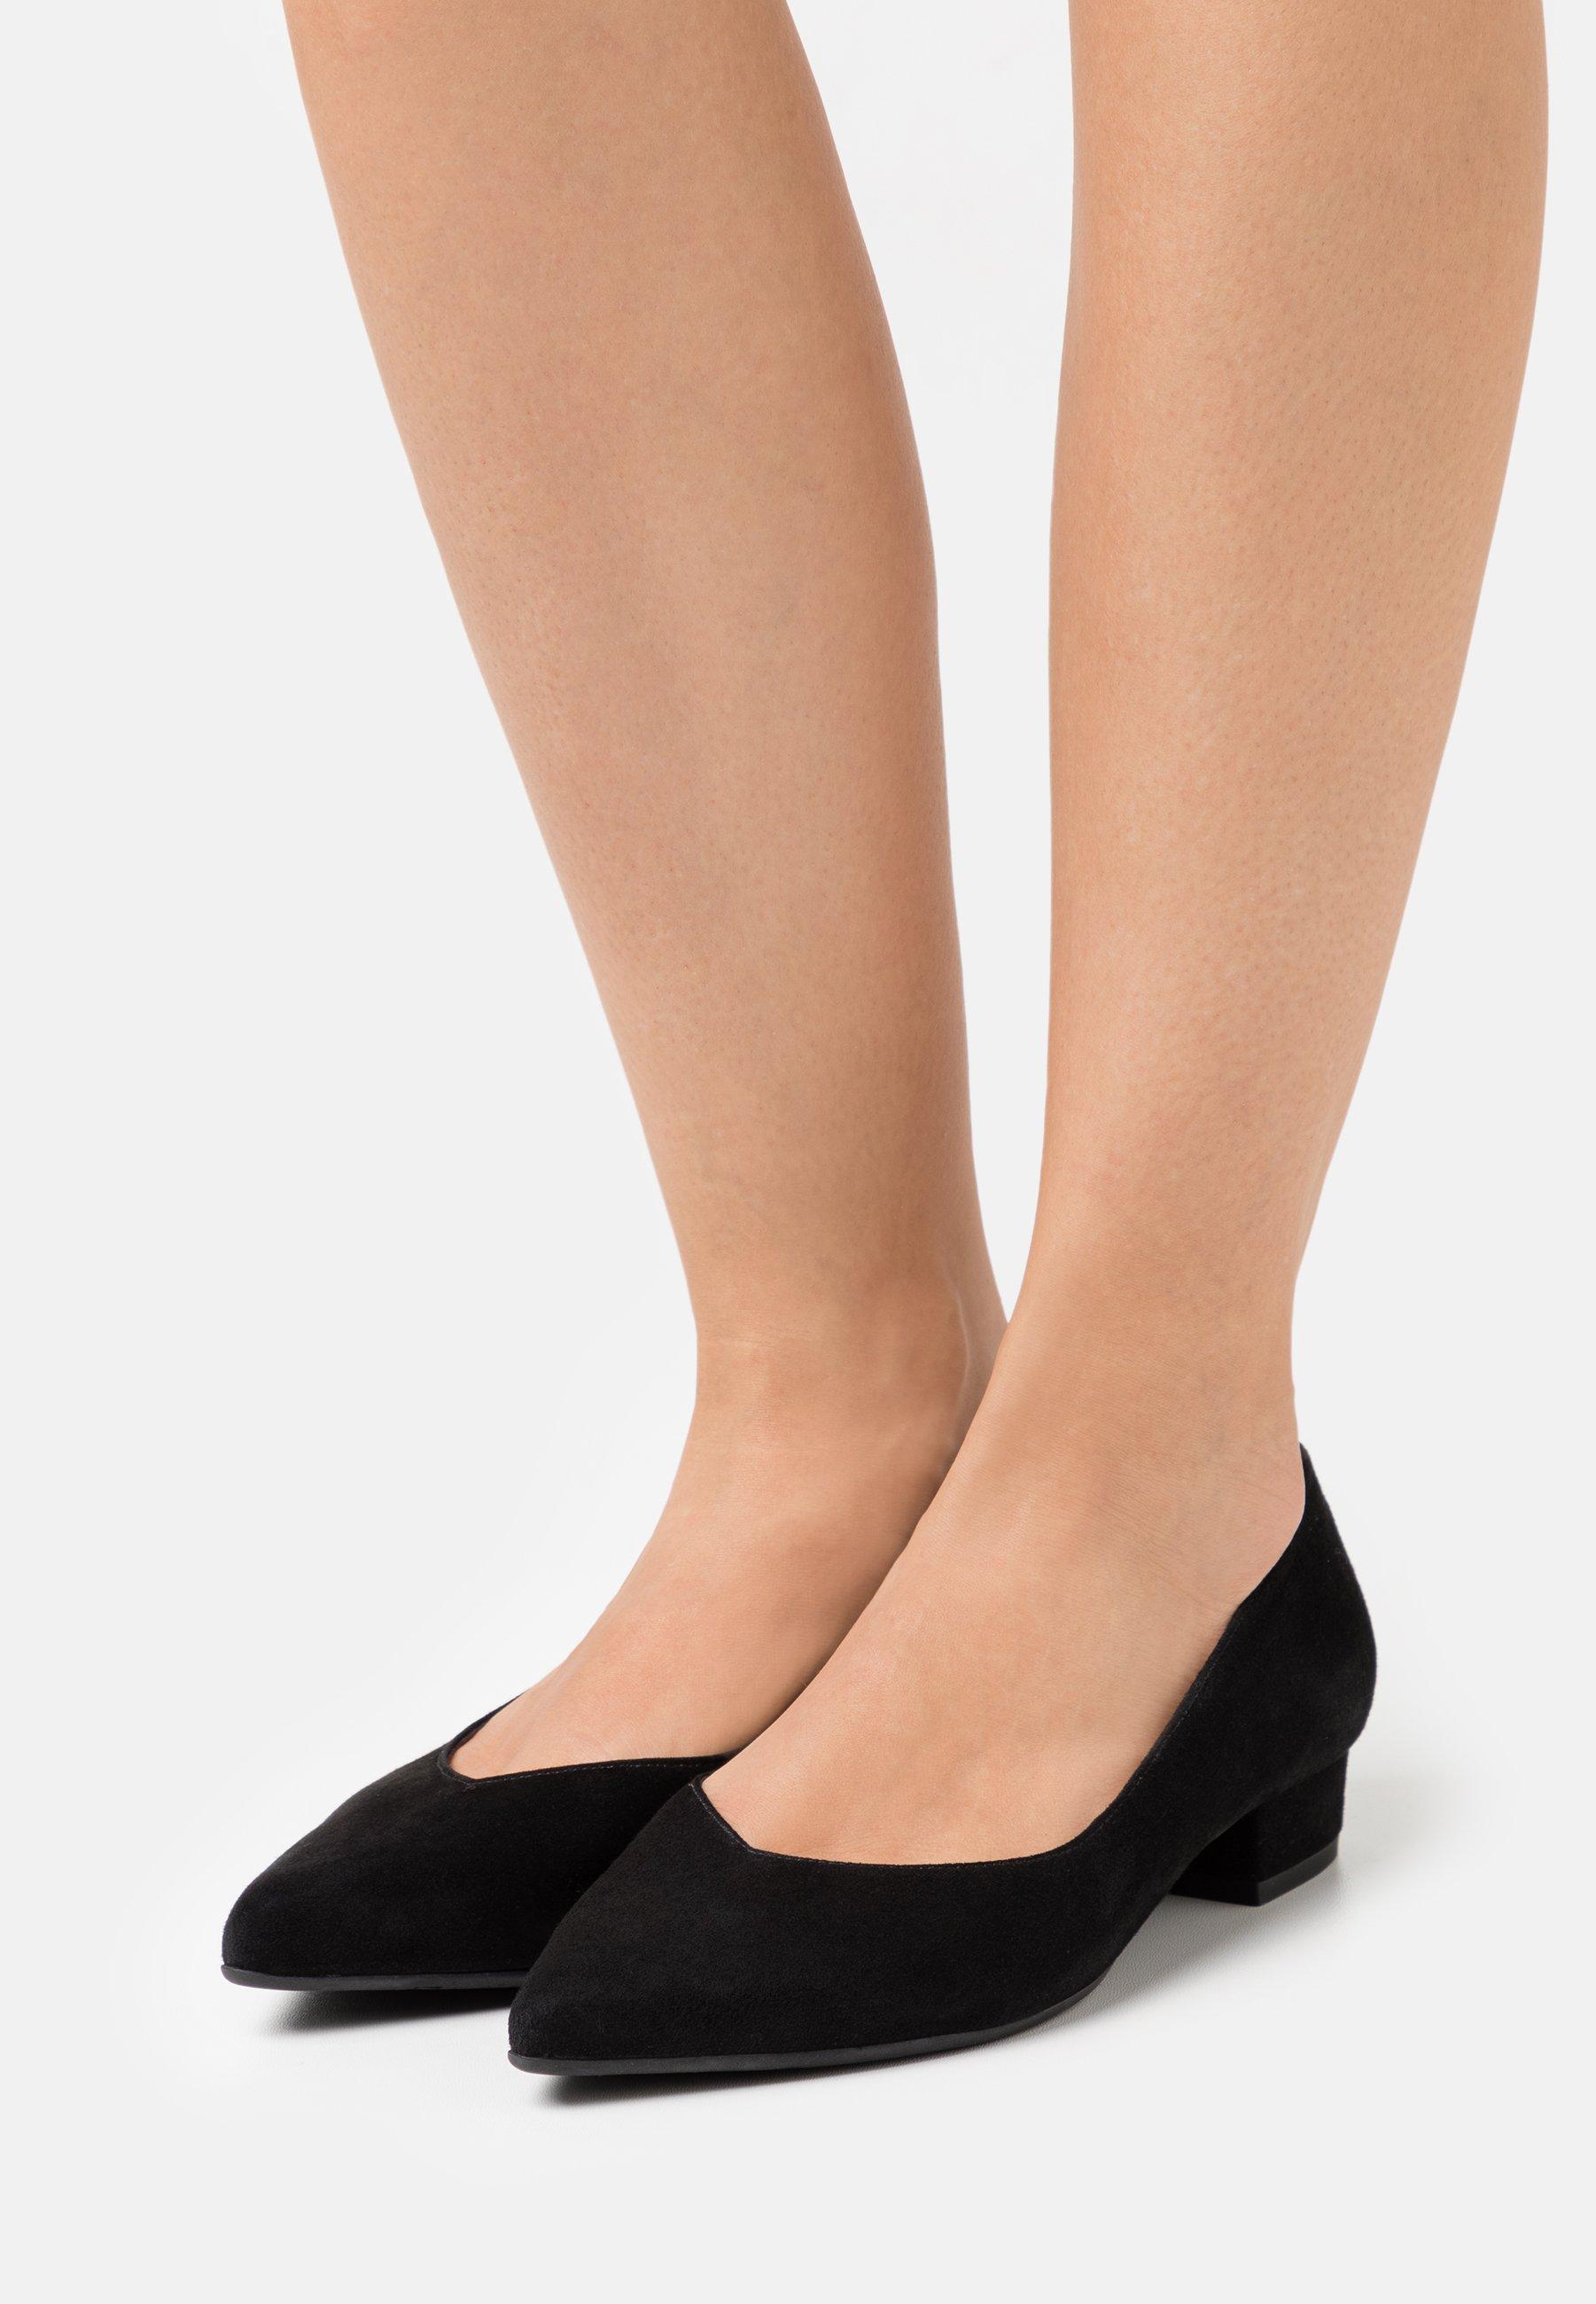 Women DRIKA - Classic heels - schwarz